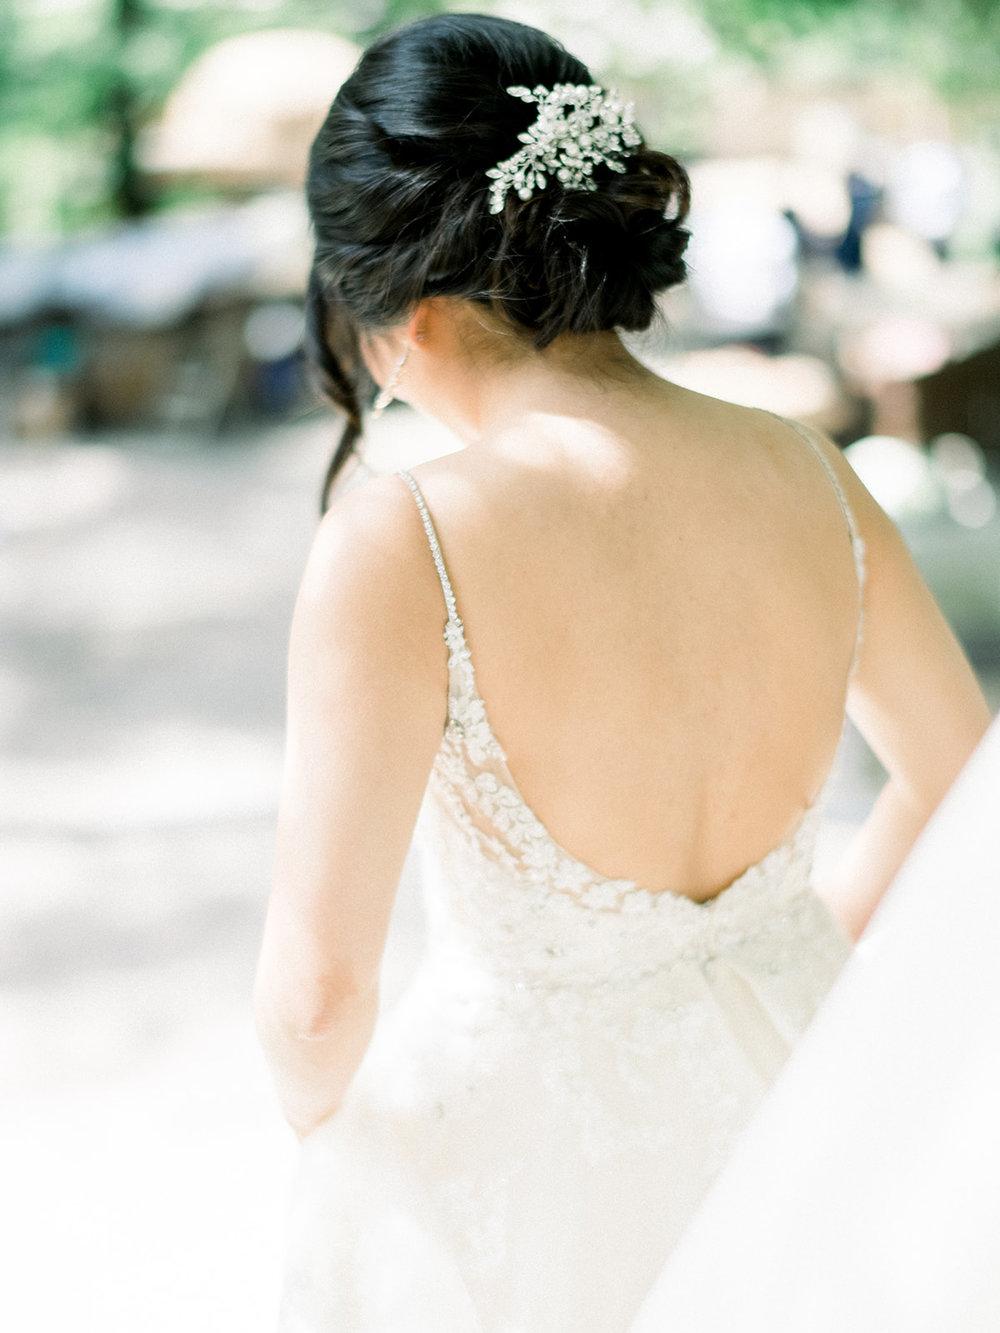 jueunandjon-etherandsmith-wedding-273.jpg